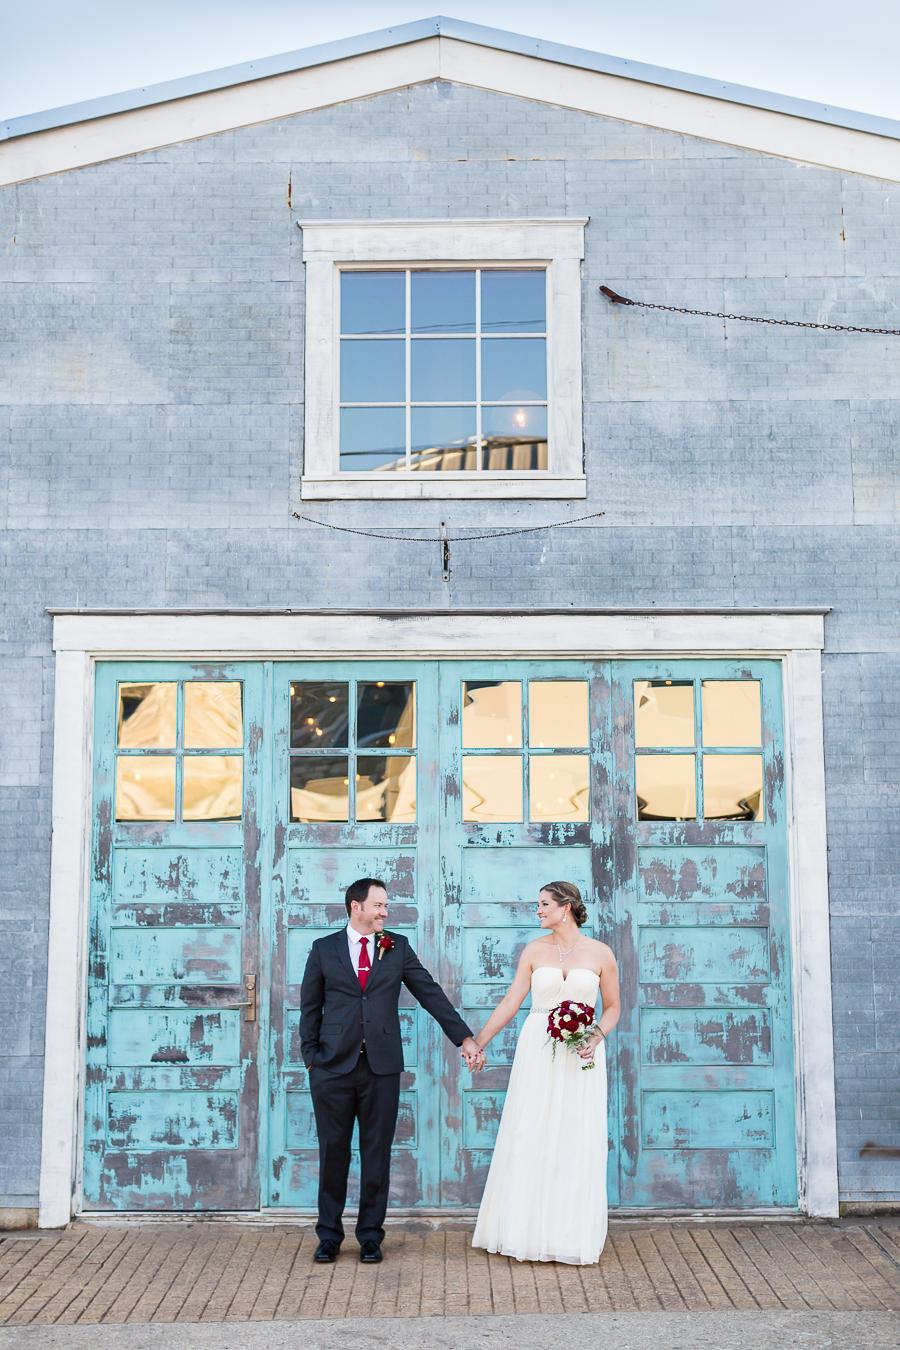 union-on-eighth-wedding-photographs-013.jpg